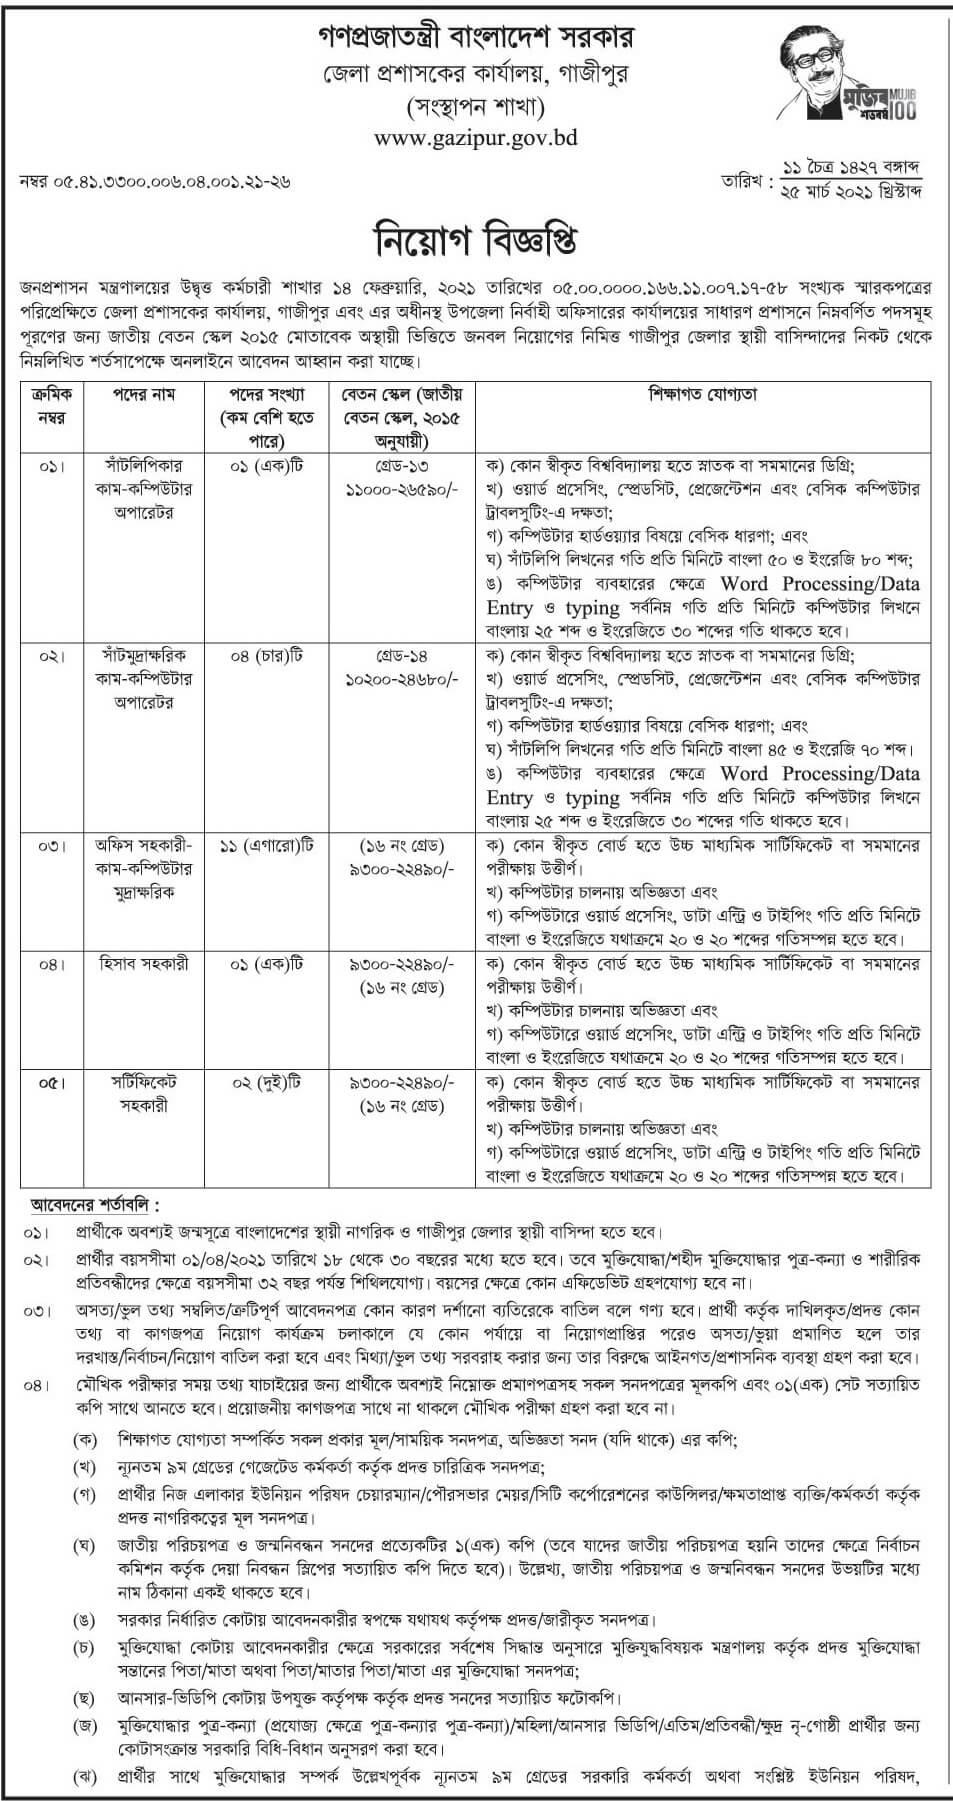 Gazipur DC Office Job Circular 2021